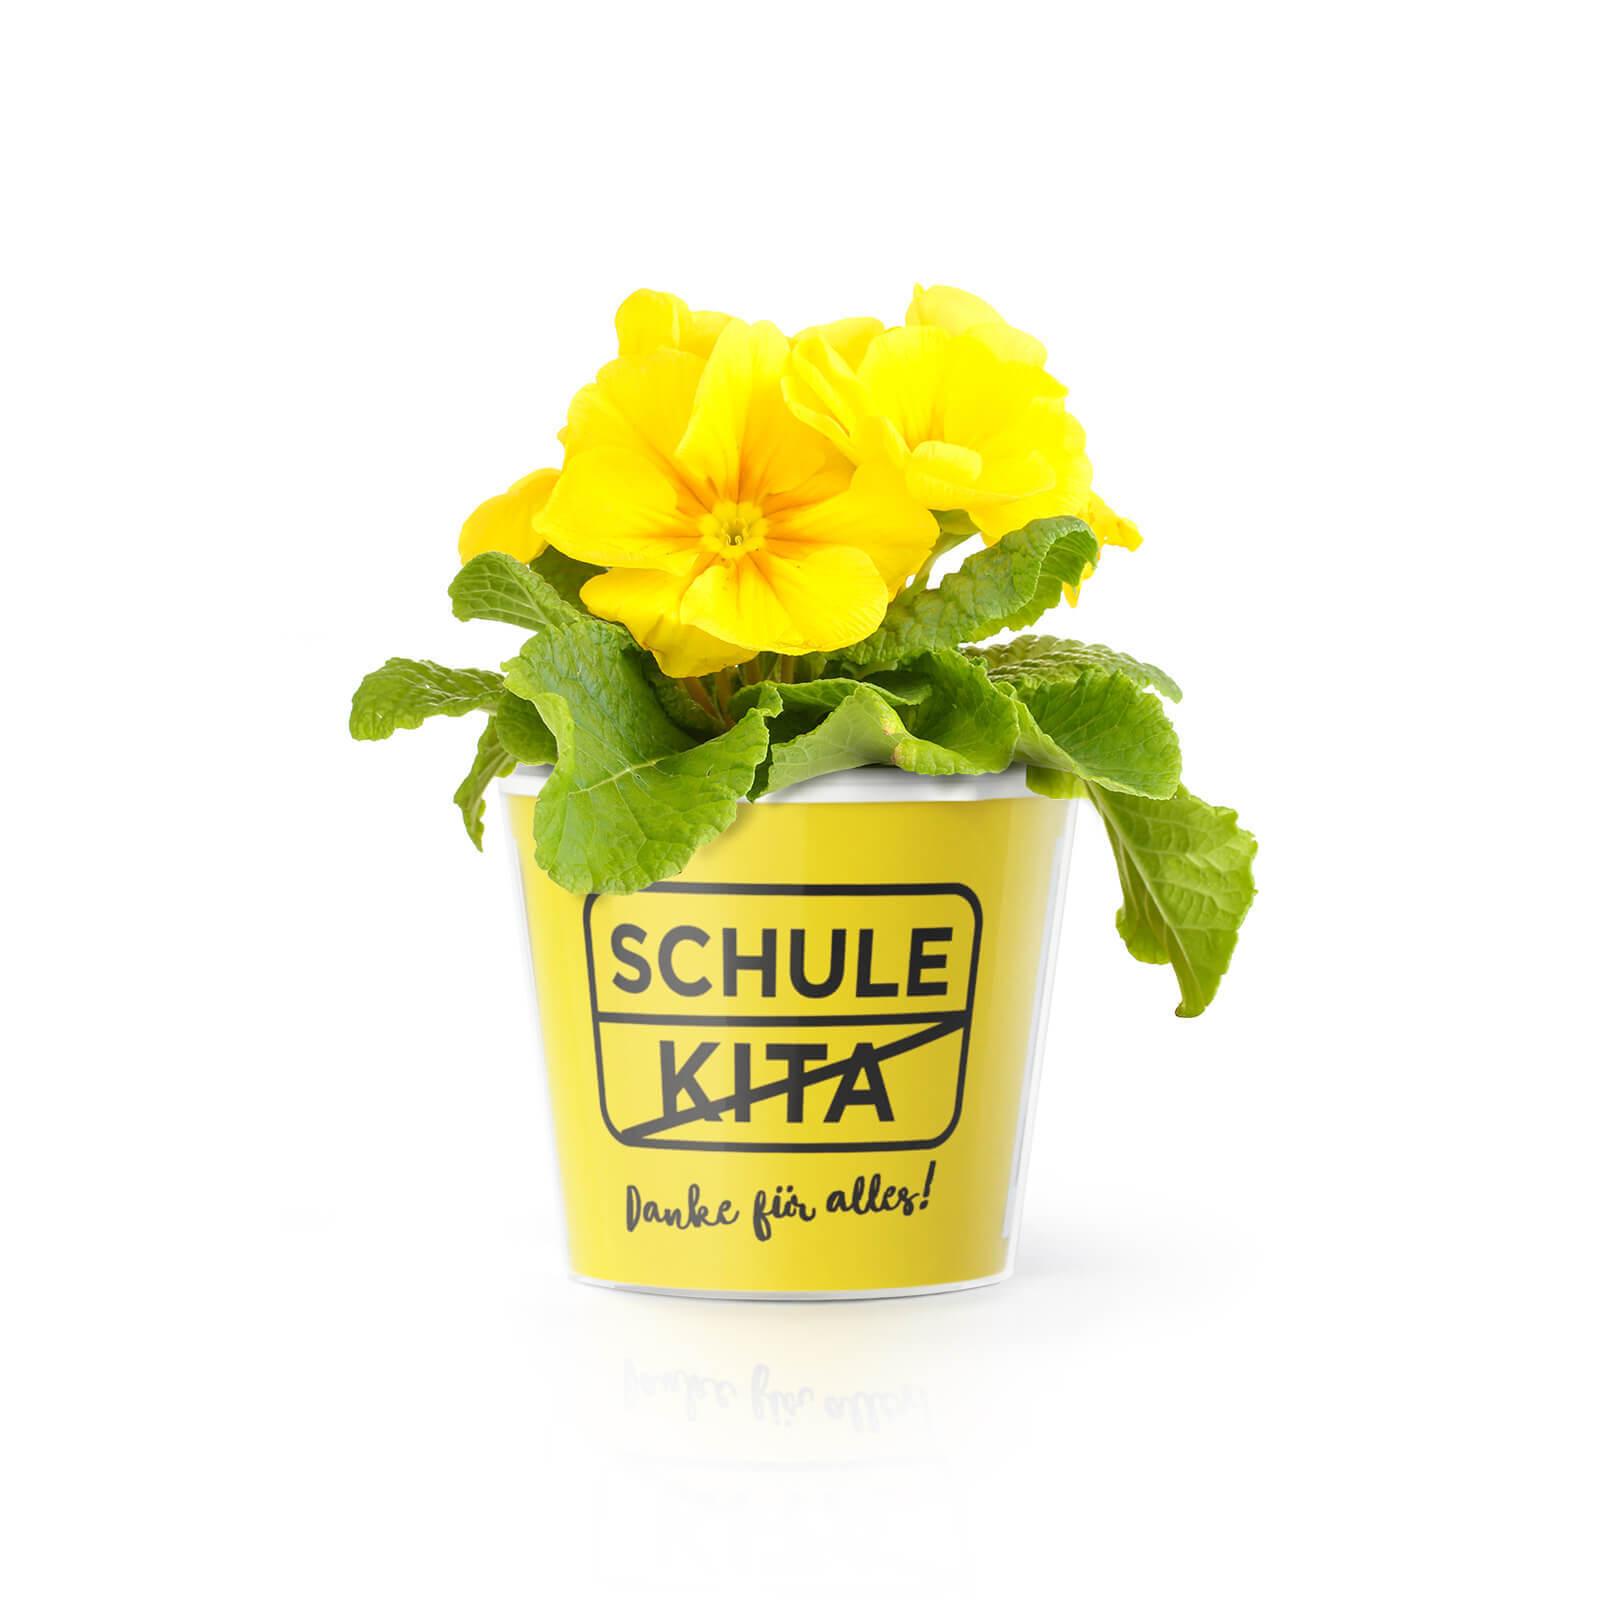 Schule Kita - Danke für Alles! Blumentopf